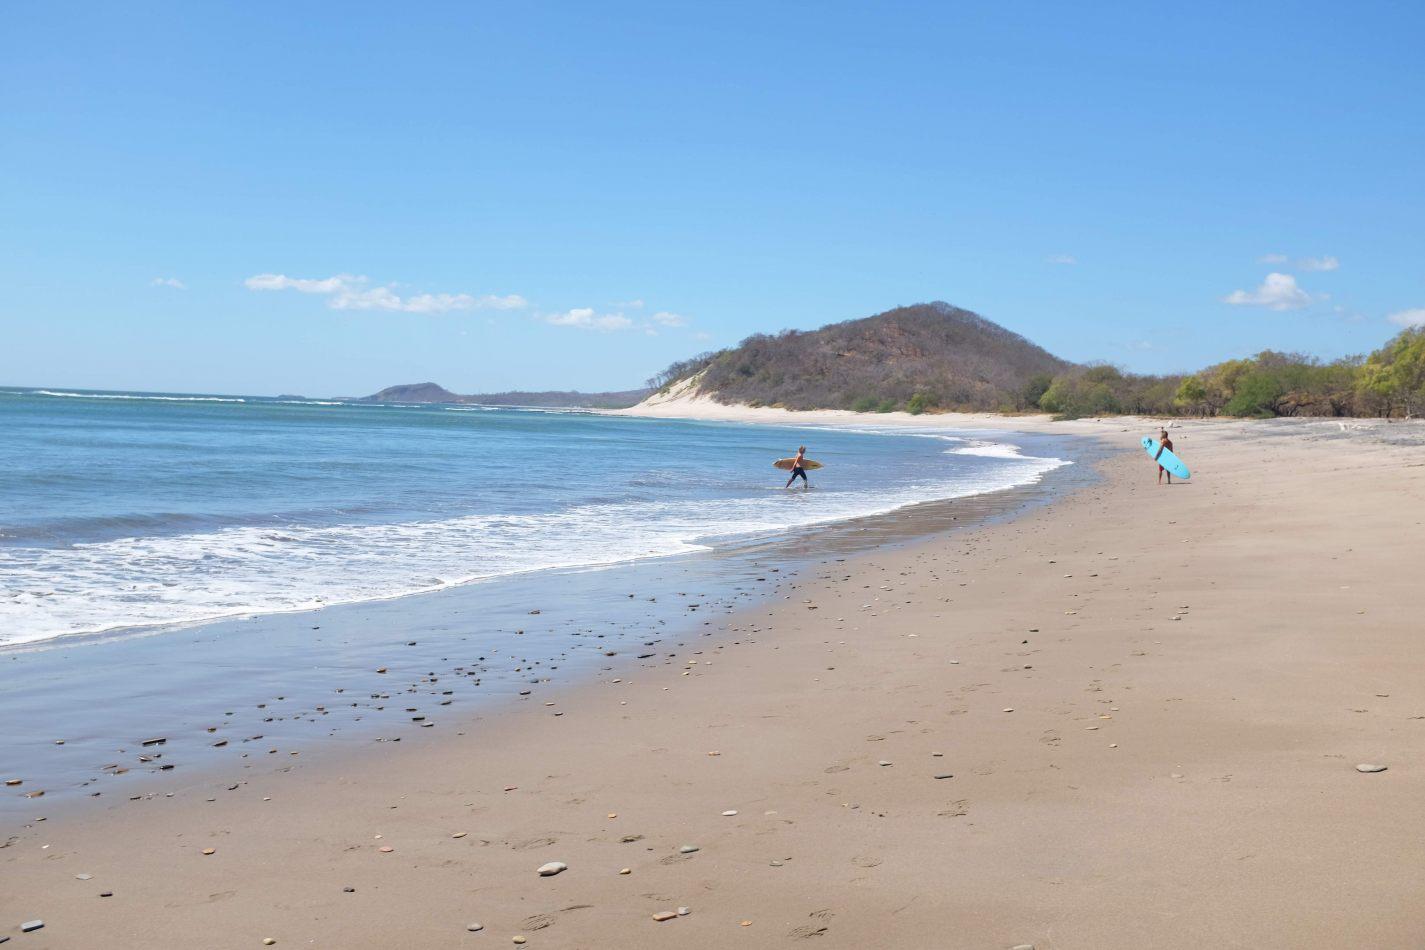 Hibiscus & Nomada : - - Surfers at Bahia Las Salinas